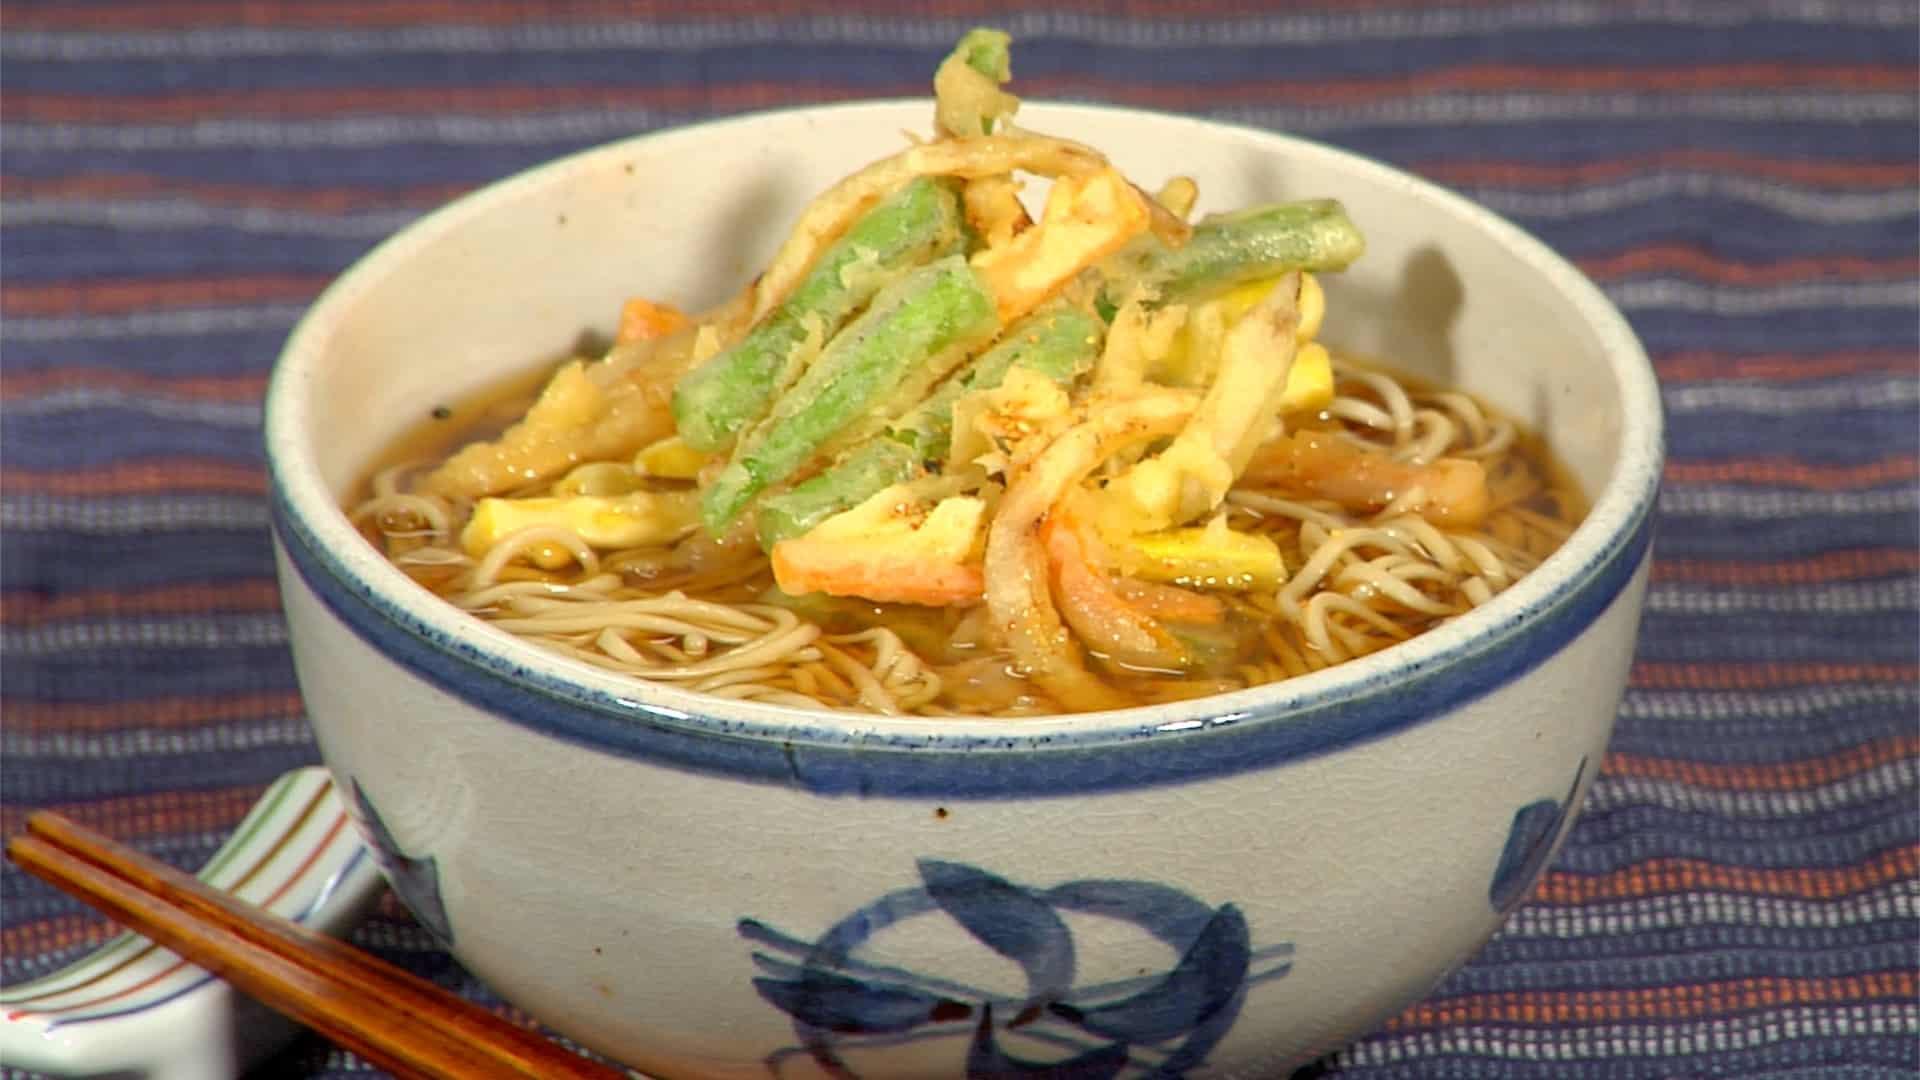 Kakiage Soba Noodles Recipe (Hot Soba with Mixed Vegetable Tempura)